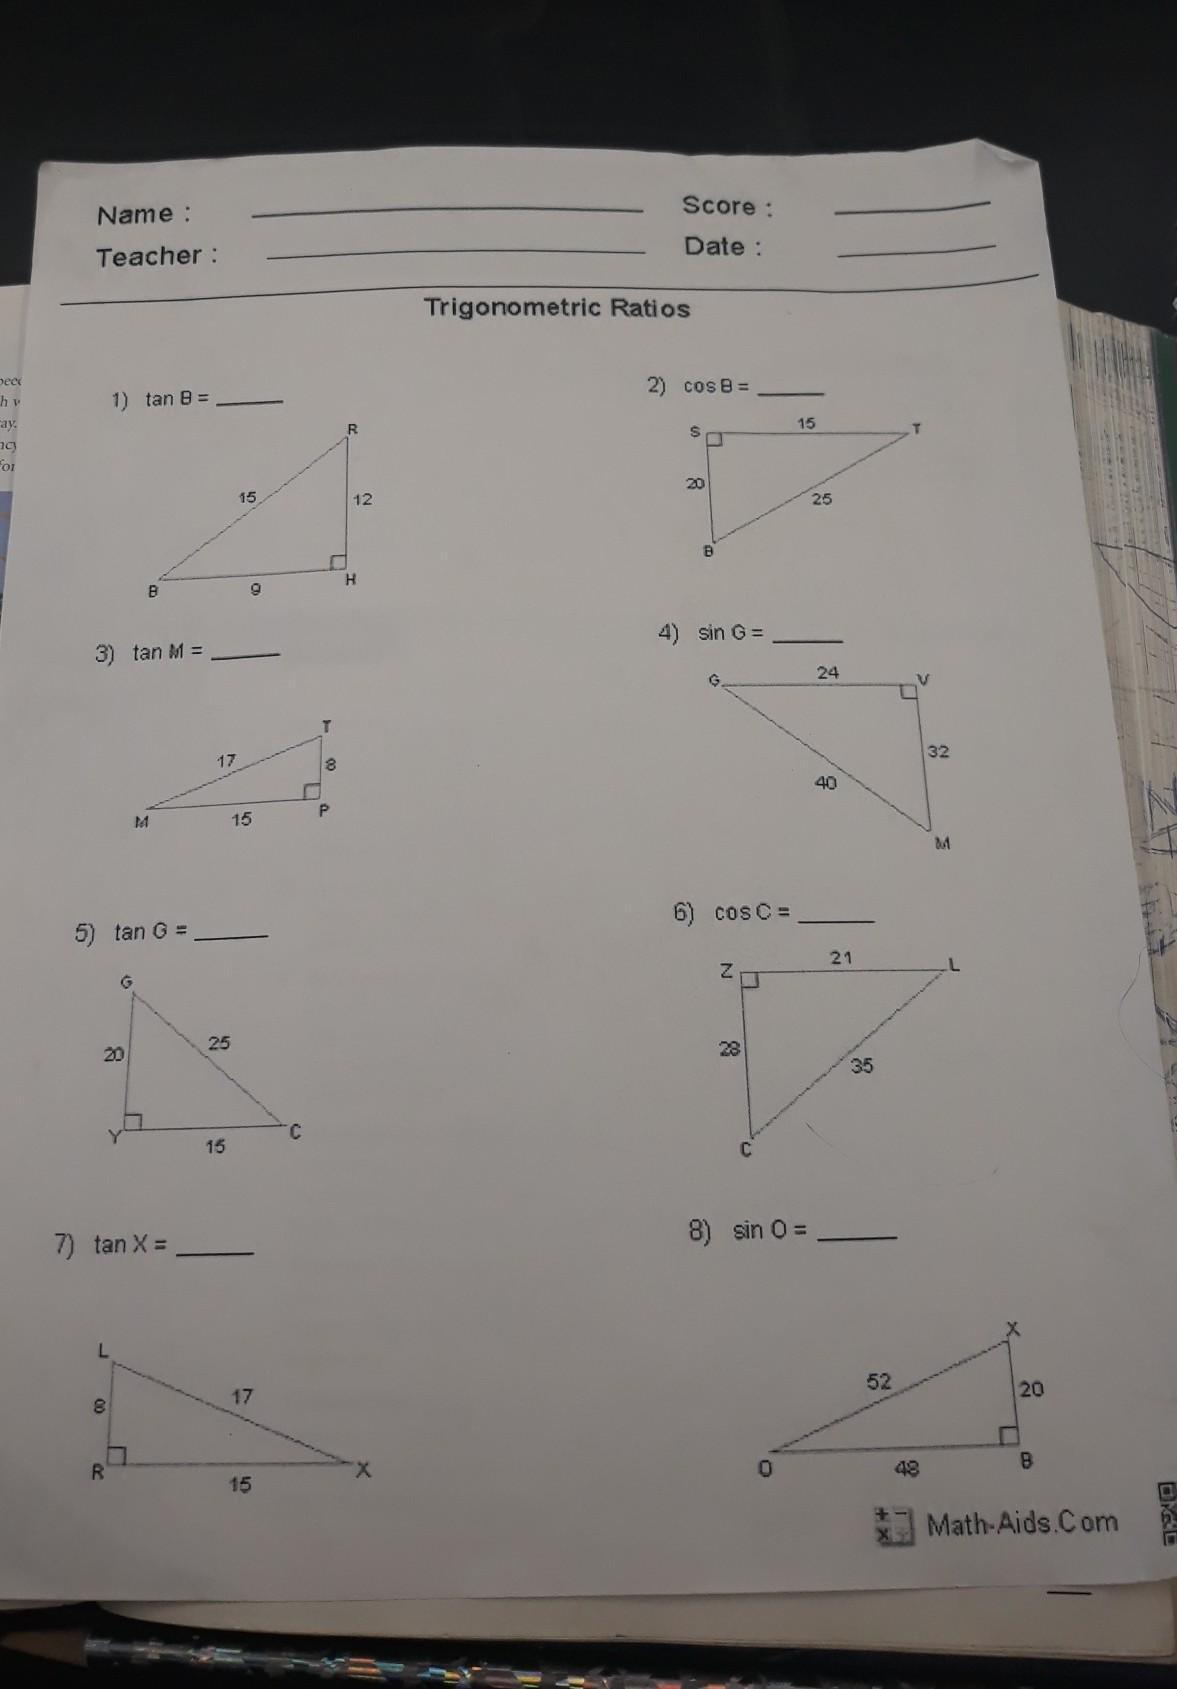 Trigonometric Ratios Worksheet From Math Aids Brainly Com [ 1689 x 1177 Pixel ]